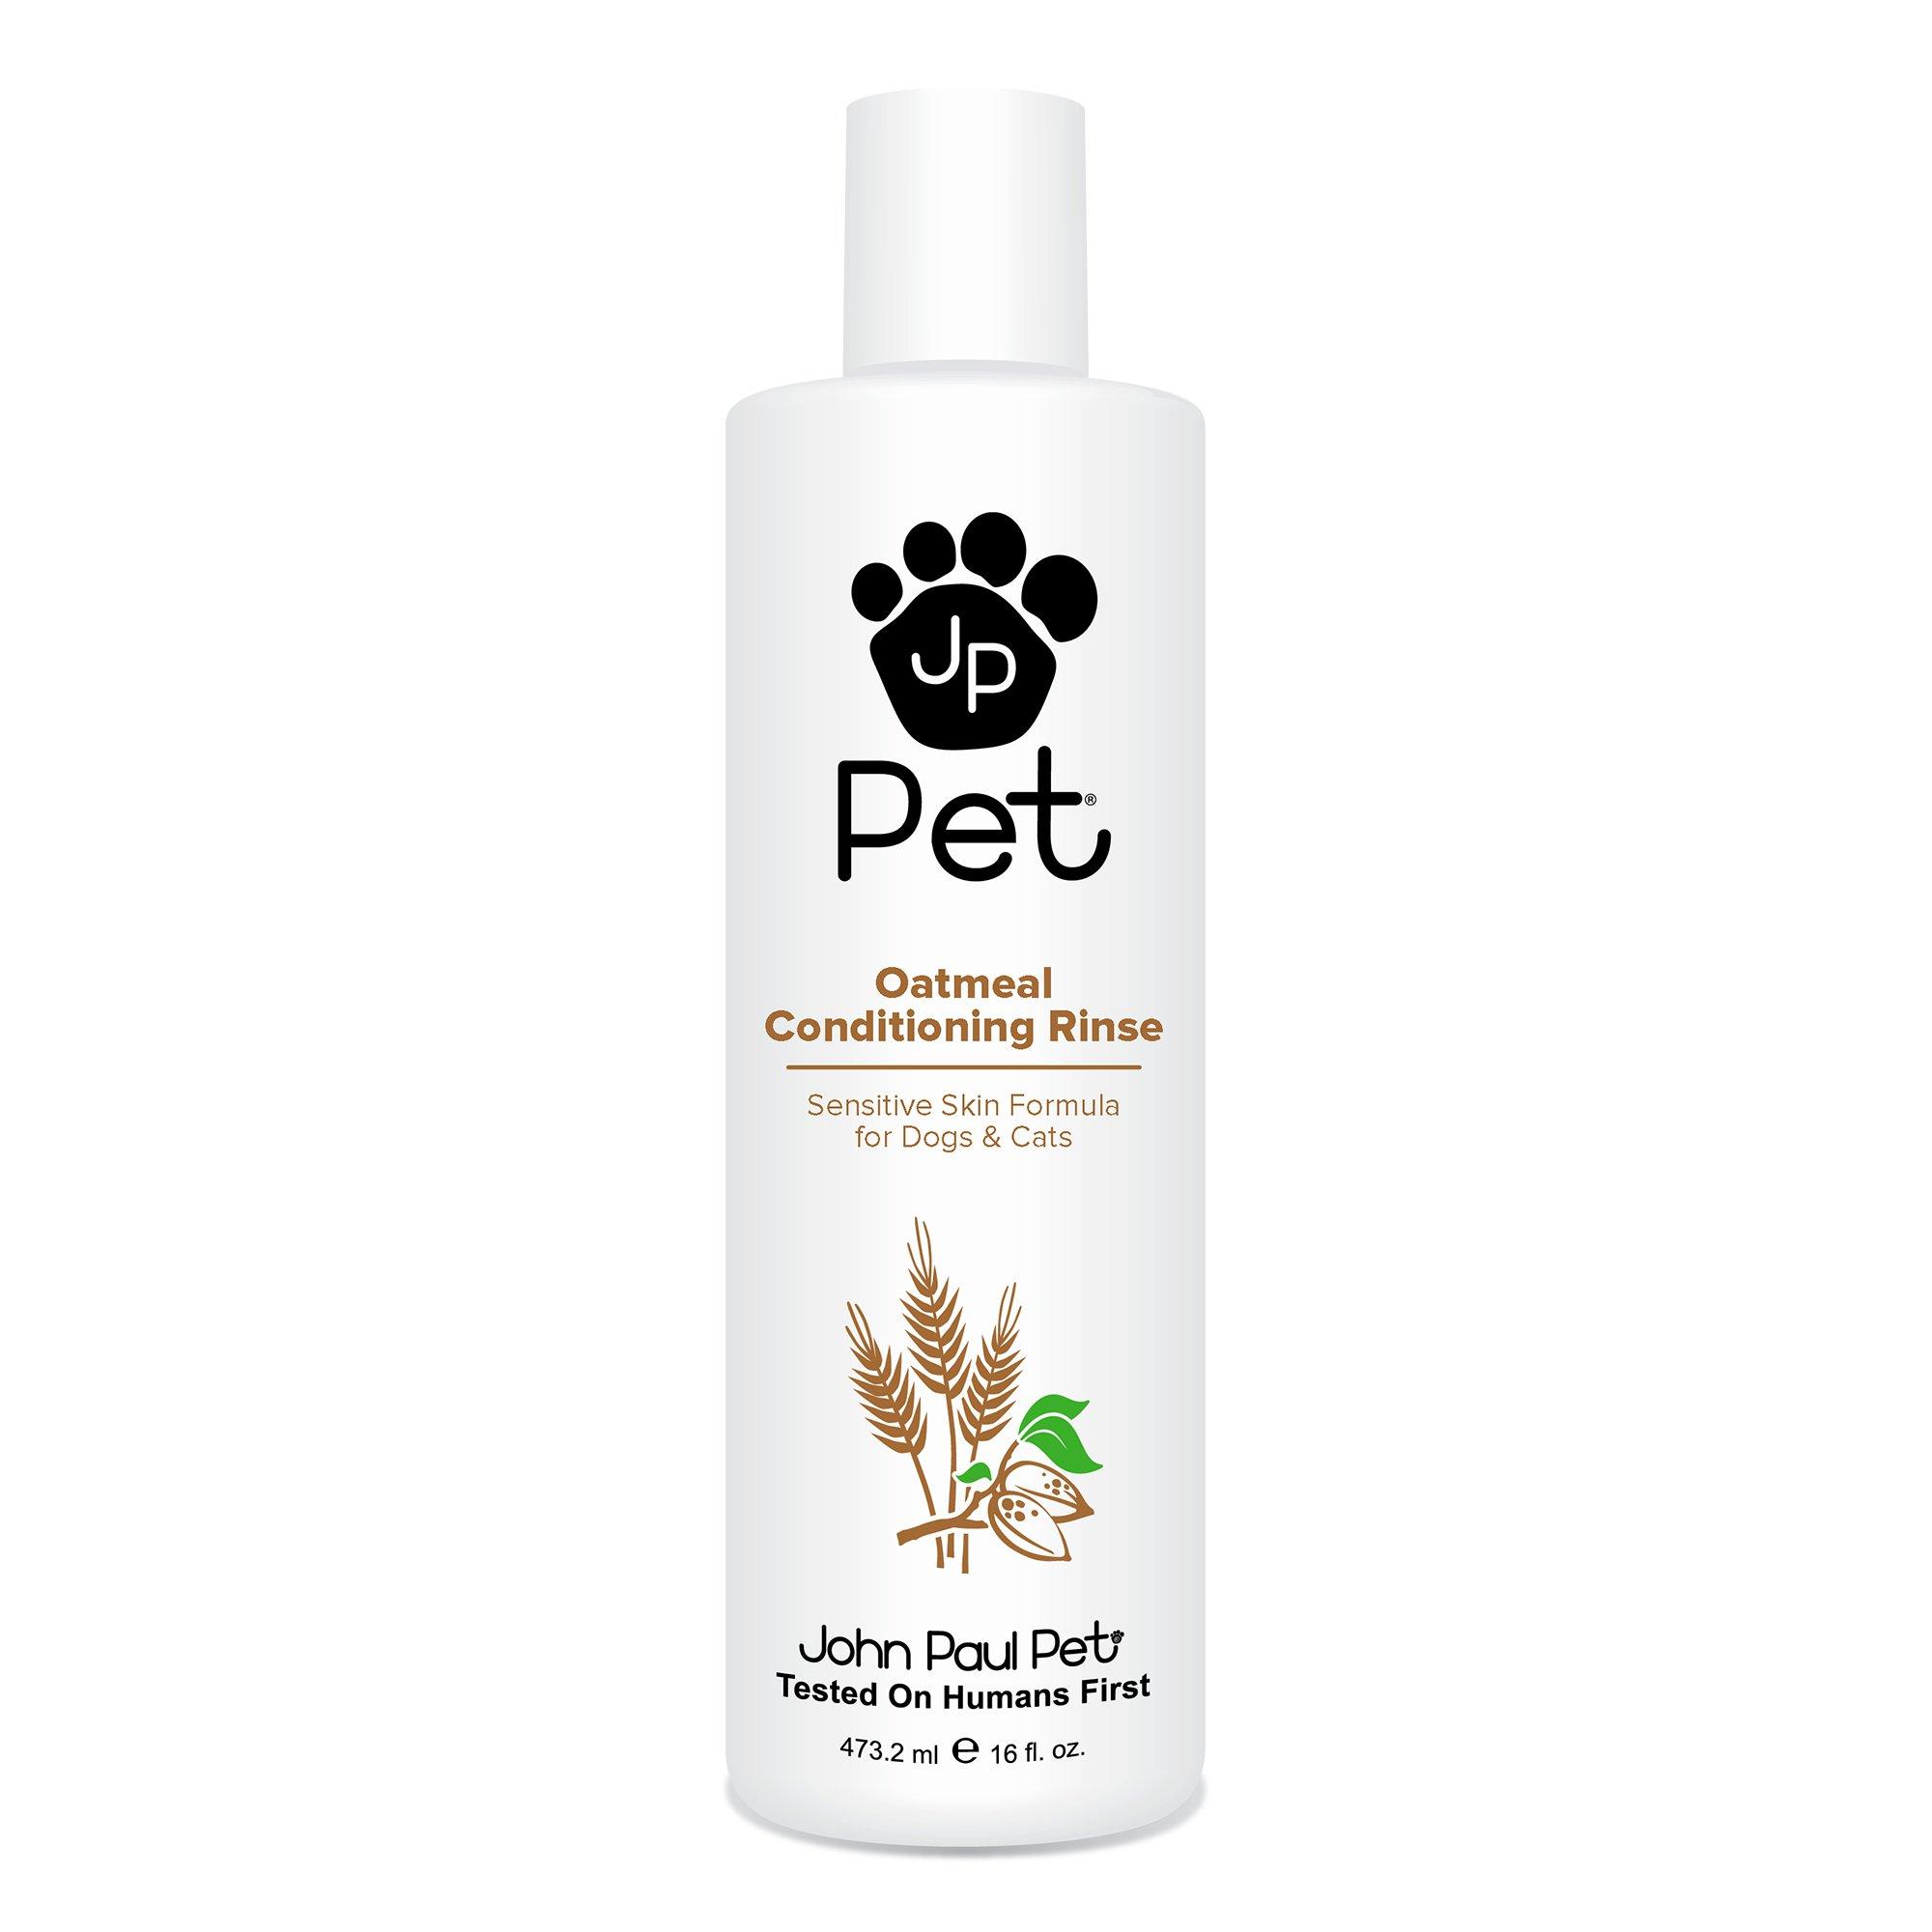 John Paul Pet Oatmeal Dog Conditioning Rinse